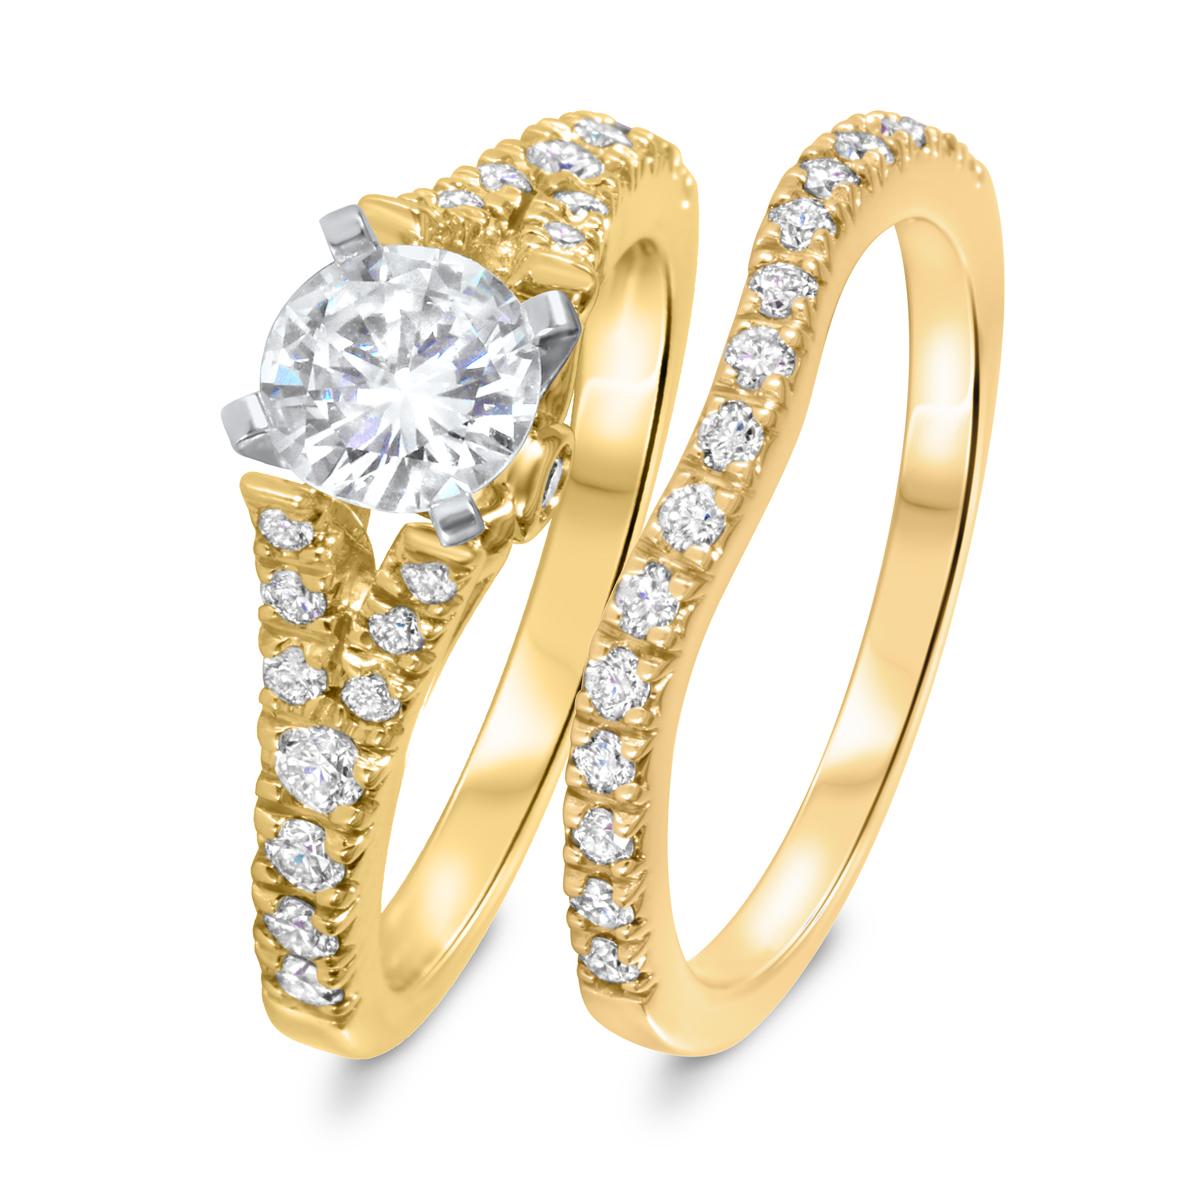 1 1/2 CT. T.W. Diamond Women's Bridal Wedding Ring Set 14K Yellow Gold